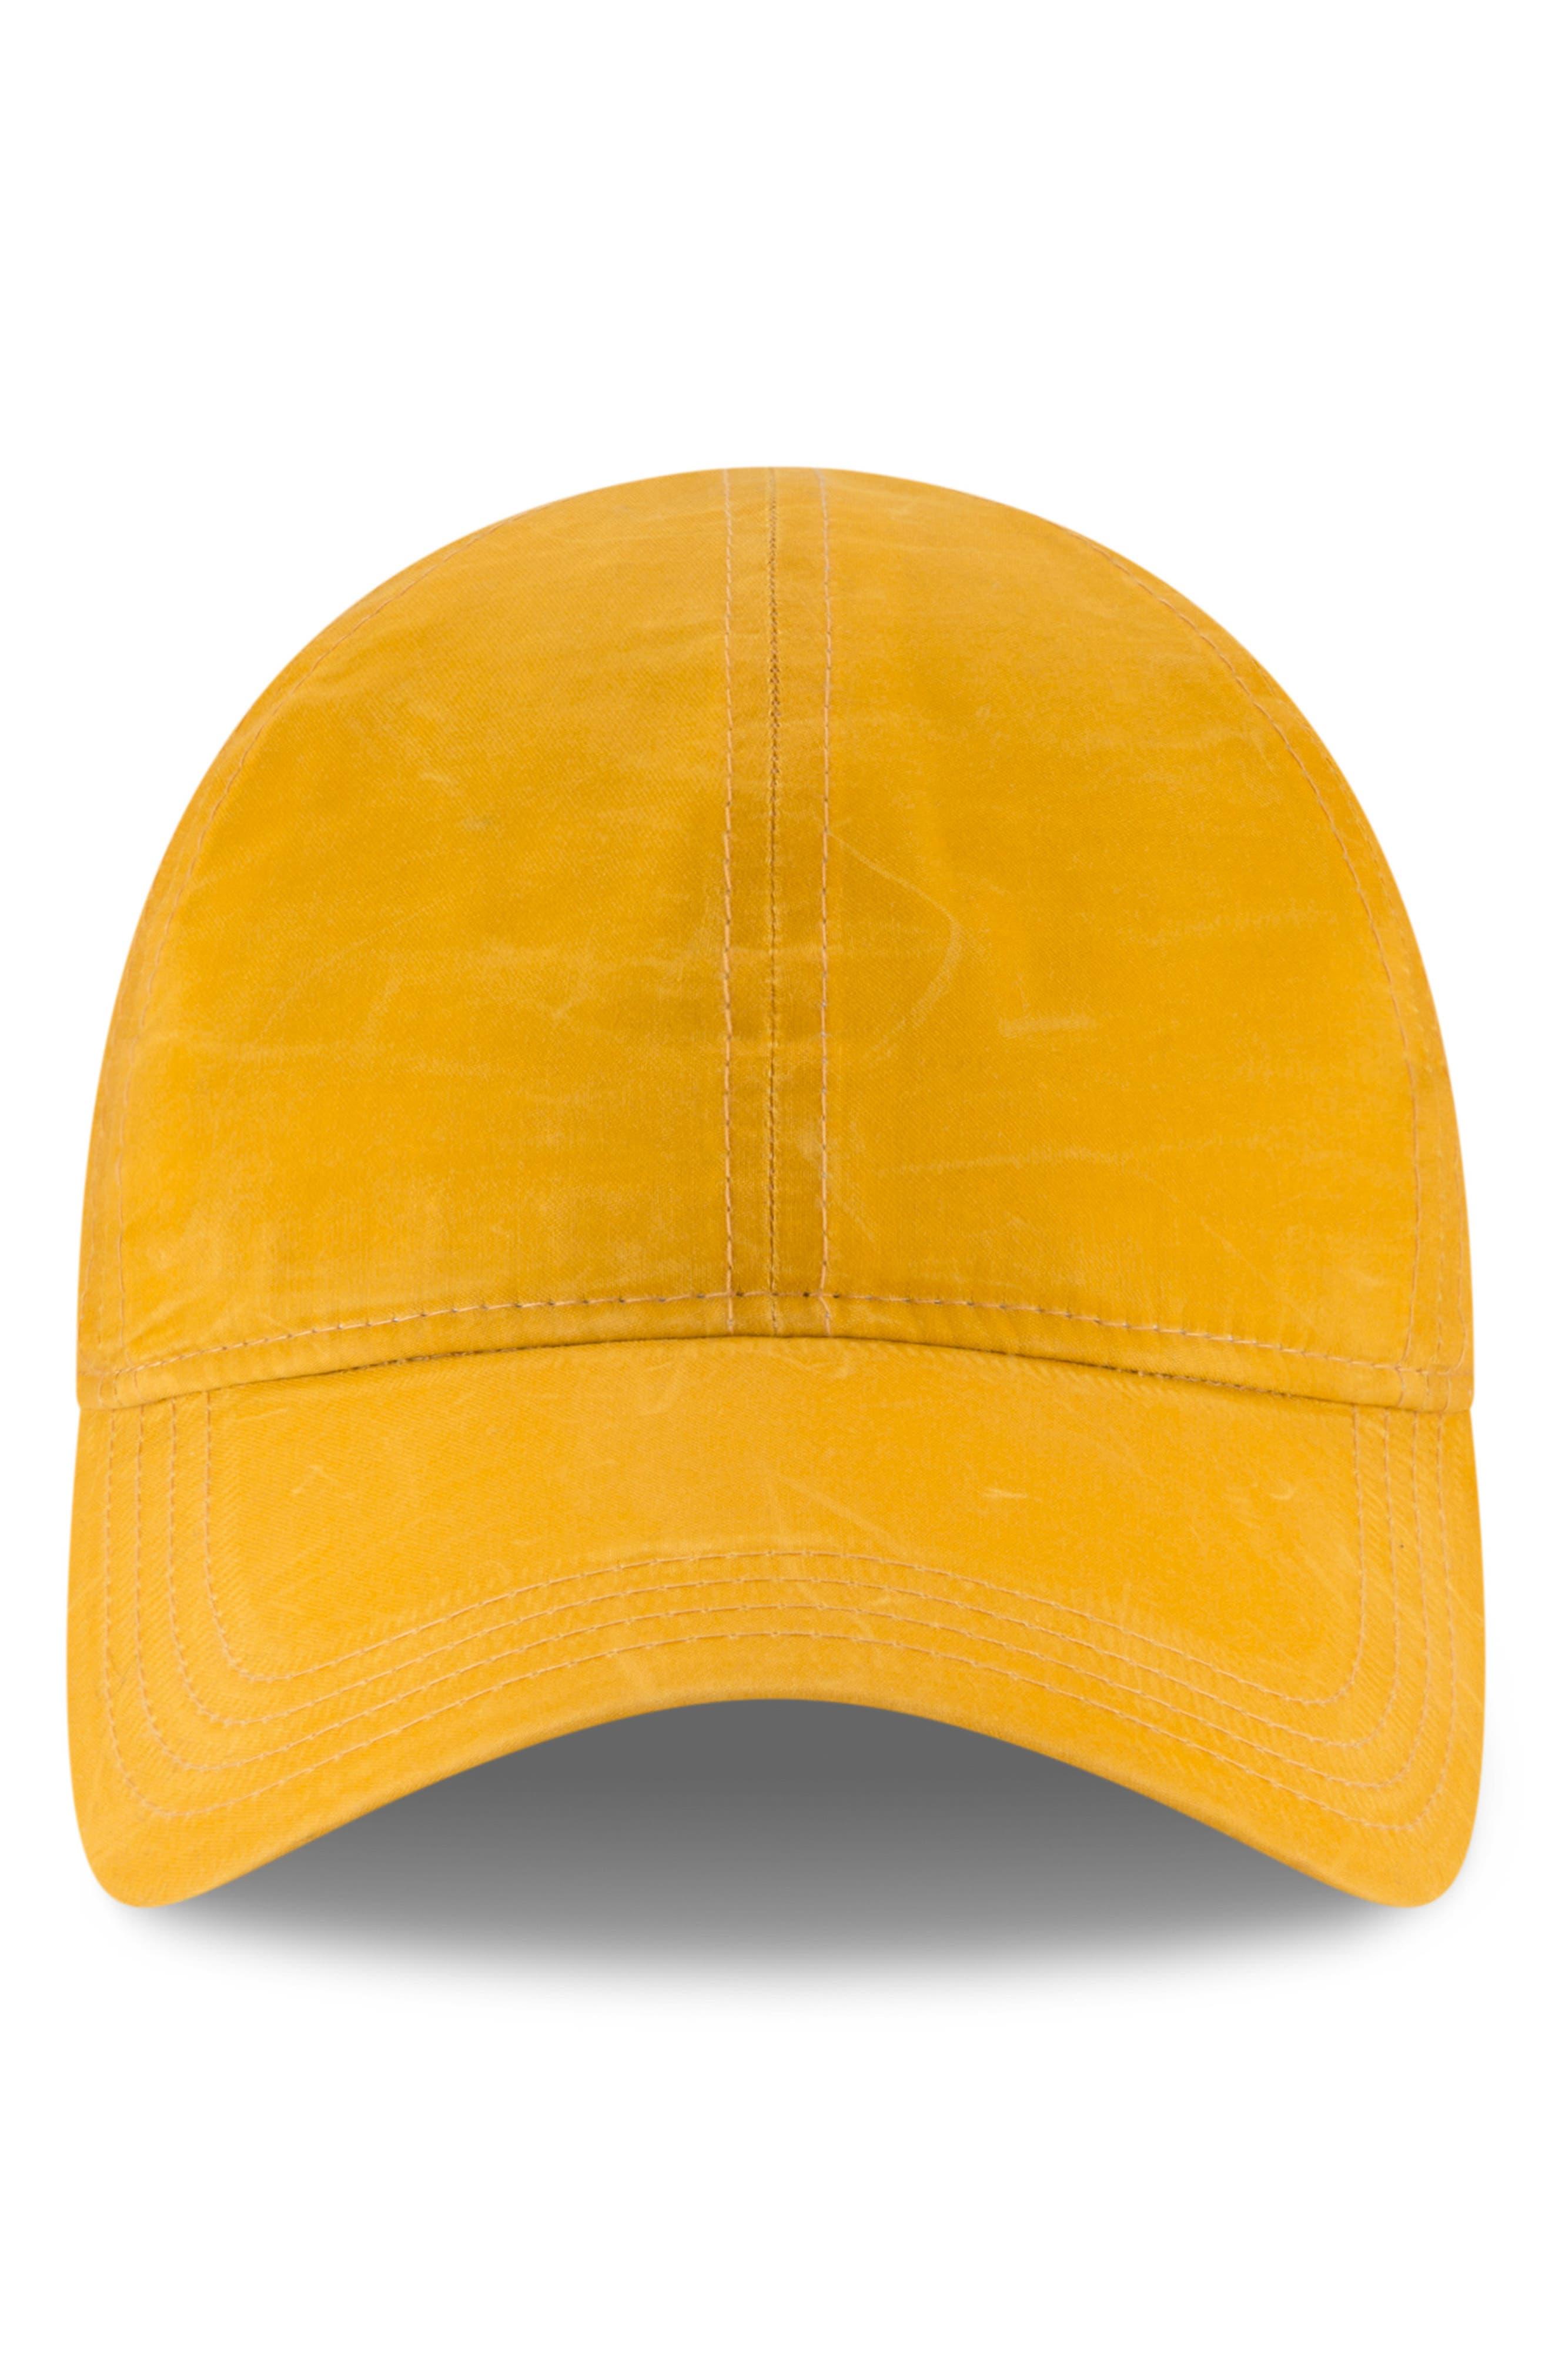 Moleskin 9Twenty Cap,                         Main,                         color, GOLD